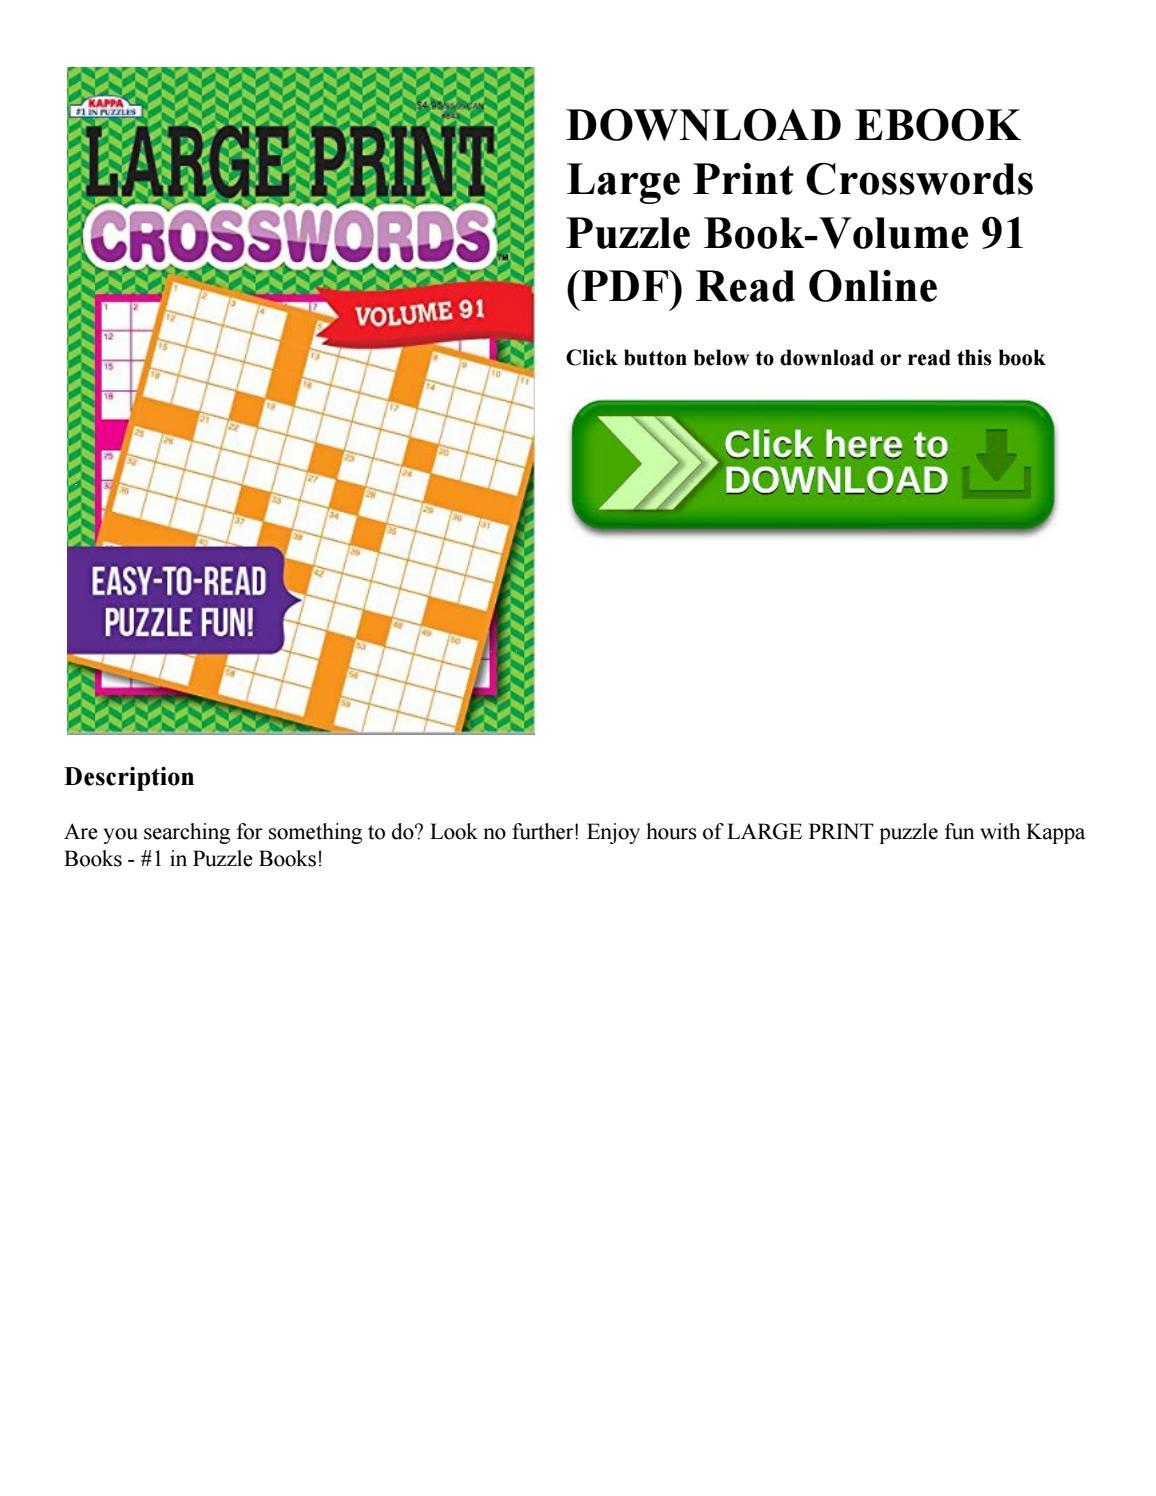 Download Ebook Large Print Crosswords Puzzle Book Volume 91 (Pdf - Printable Puzzle Book Pdf